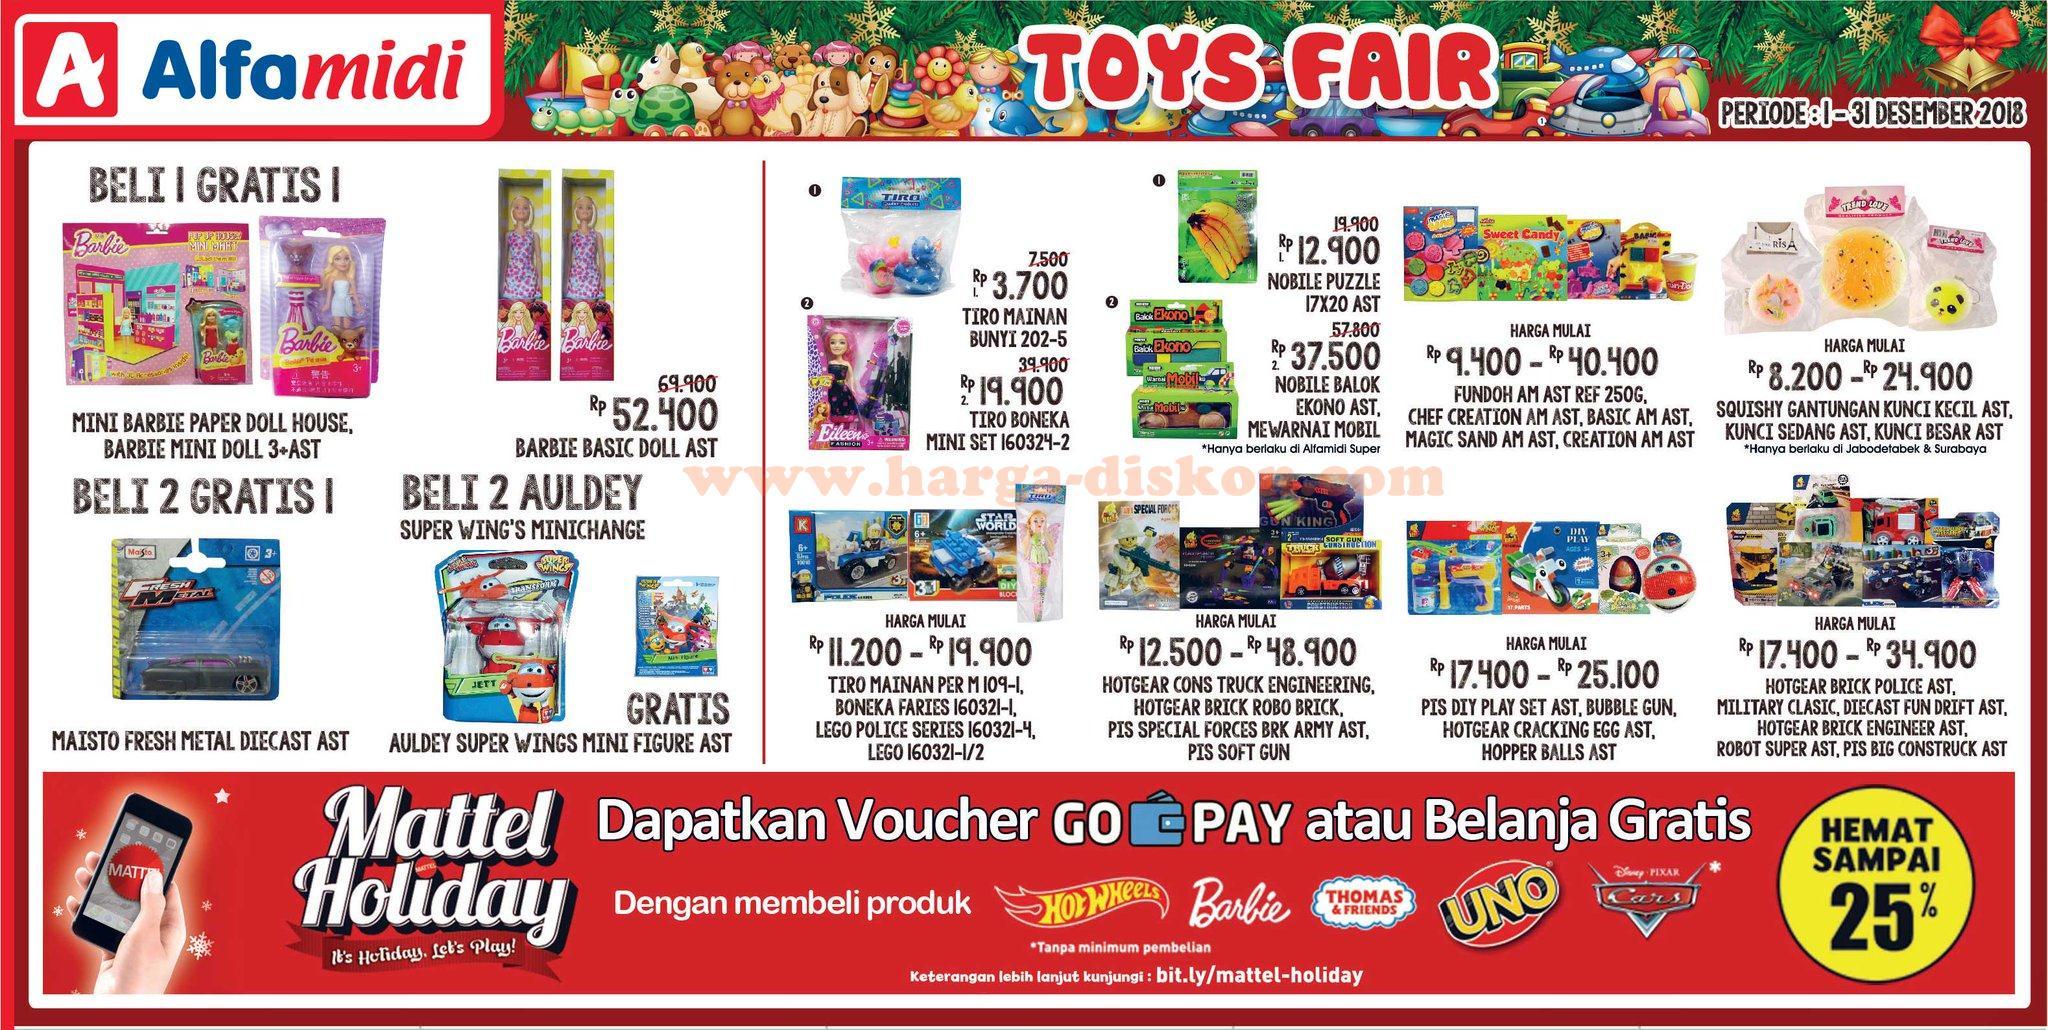 Promo Alfamidi Terbaru Toys Fair 1 31 Desember 2018 Harga Diskon